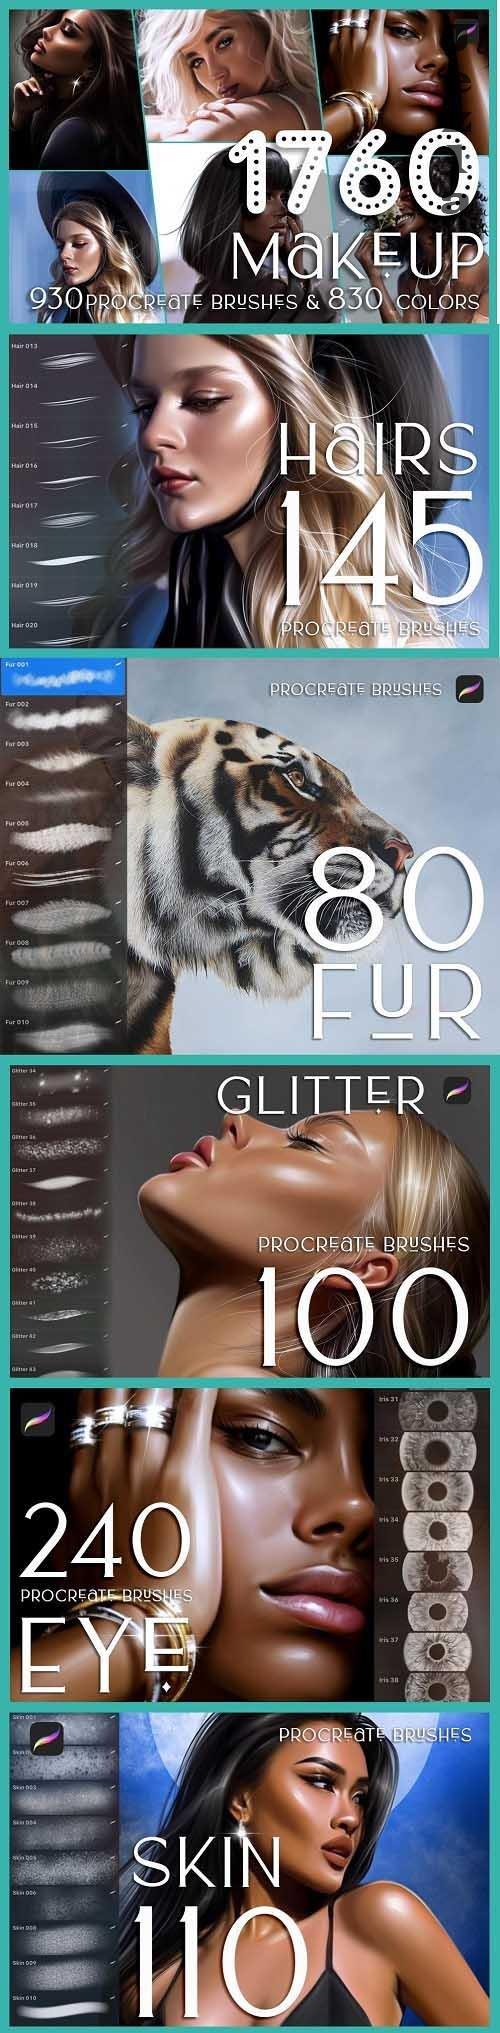 1760 Procreate Makeup Brushes - 6281796